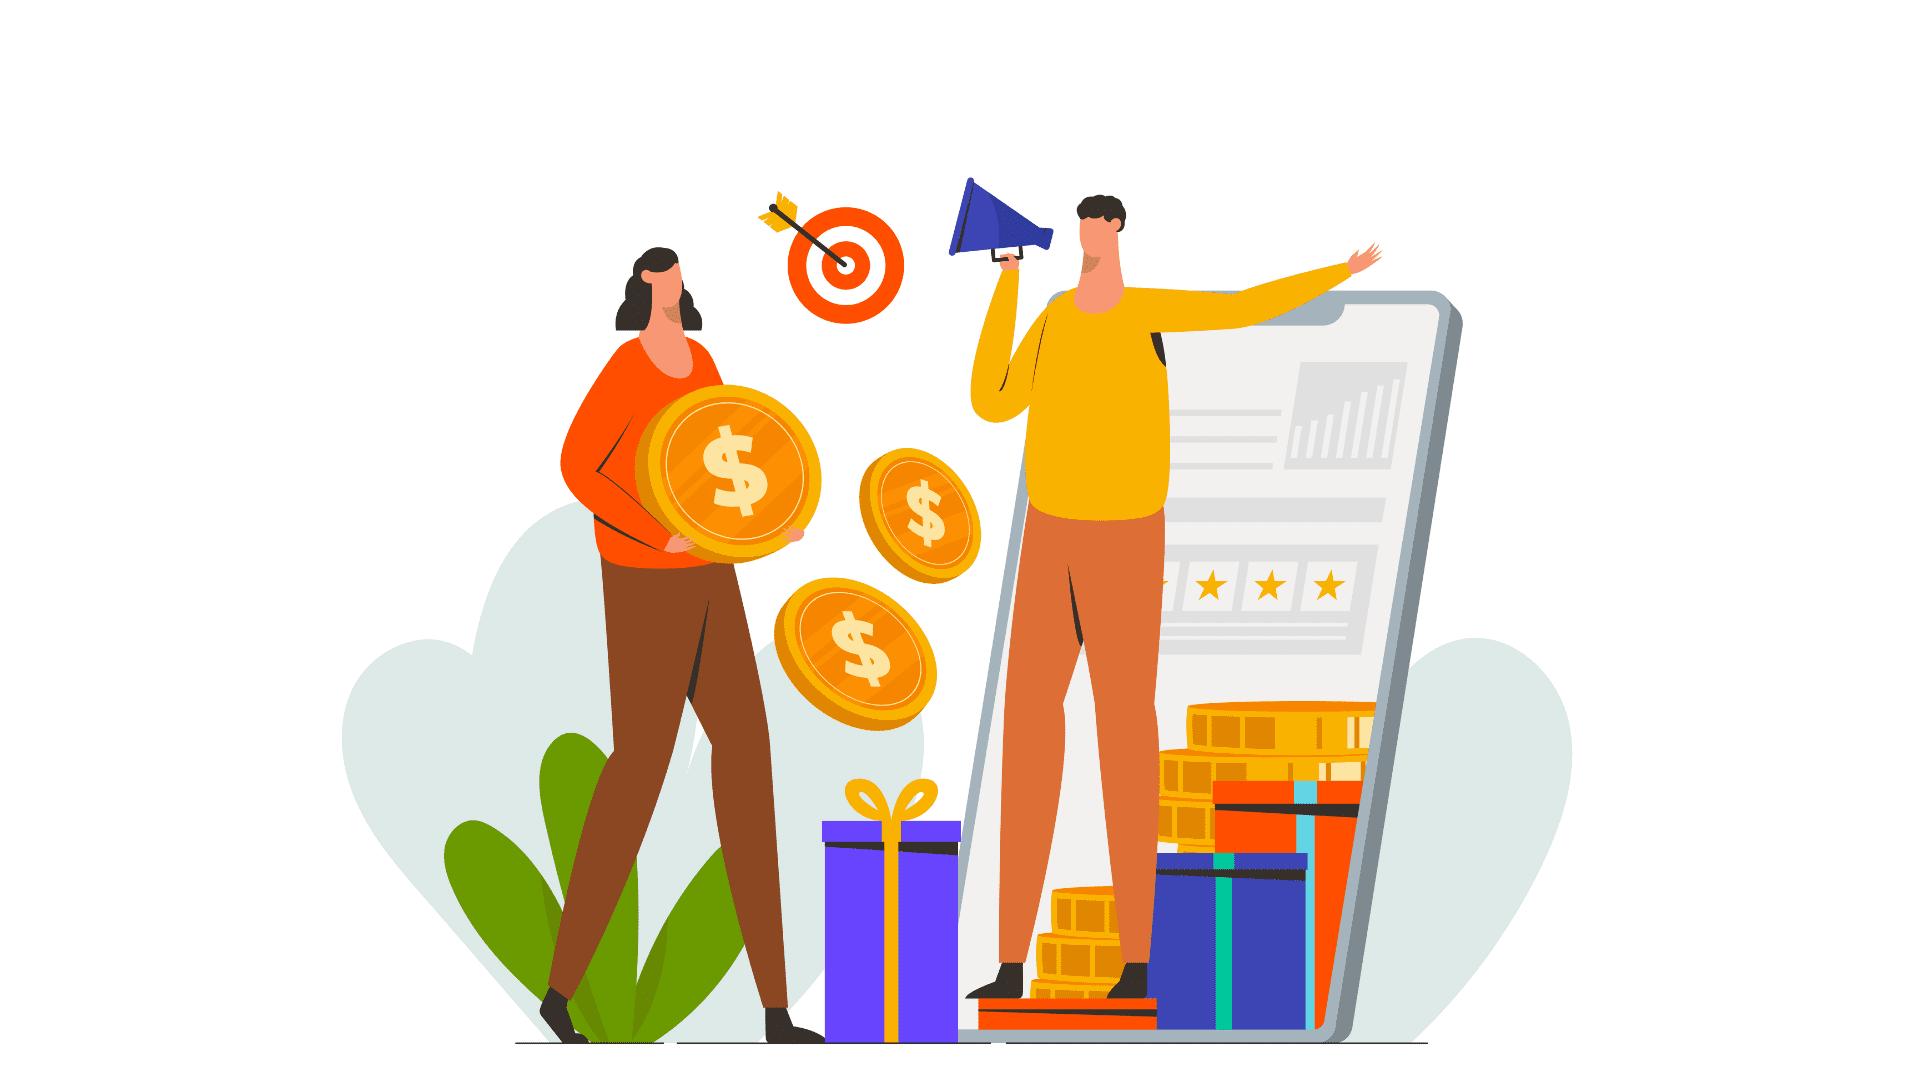 in-app ad & marketing